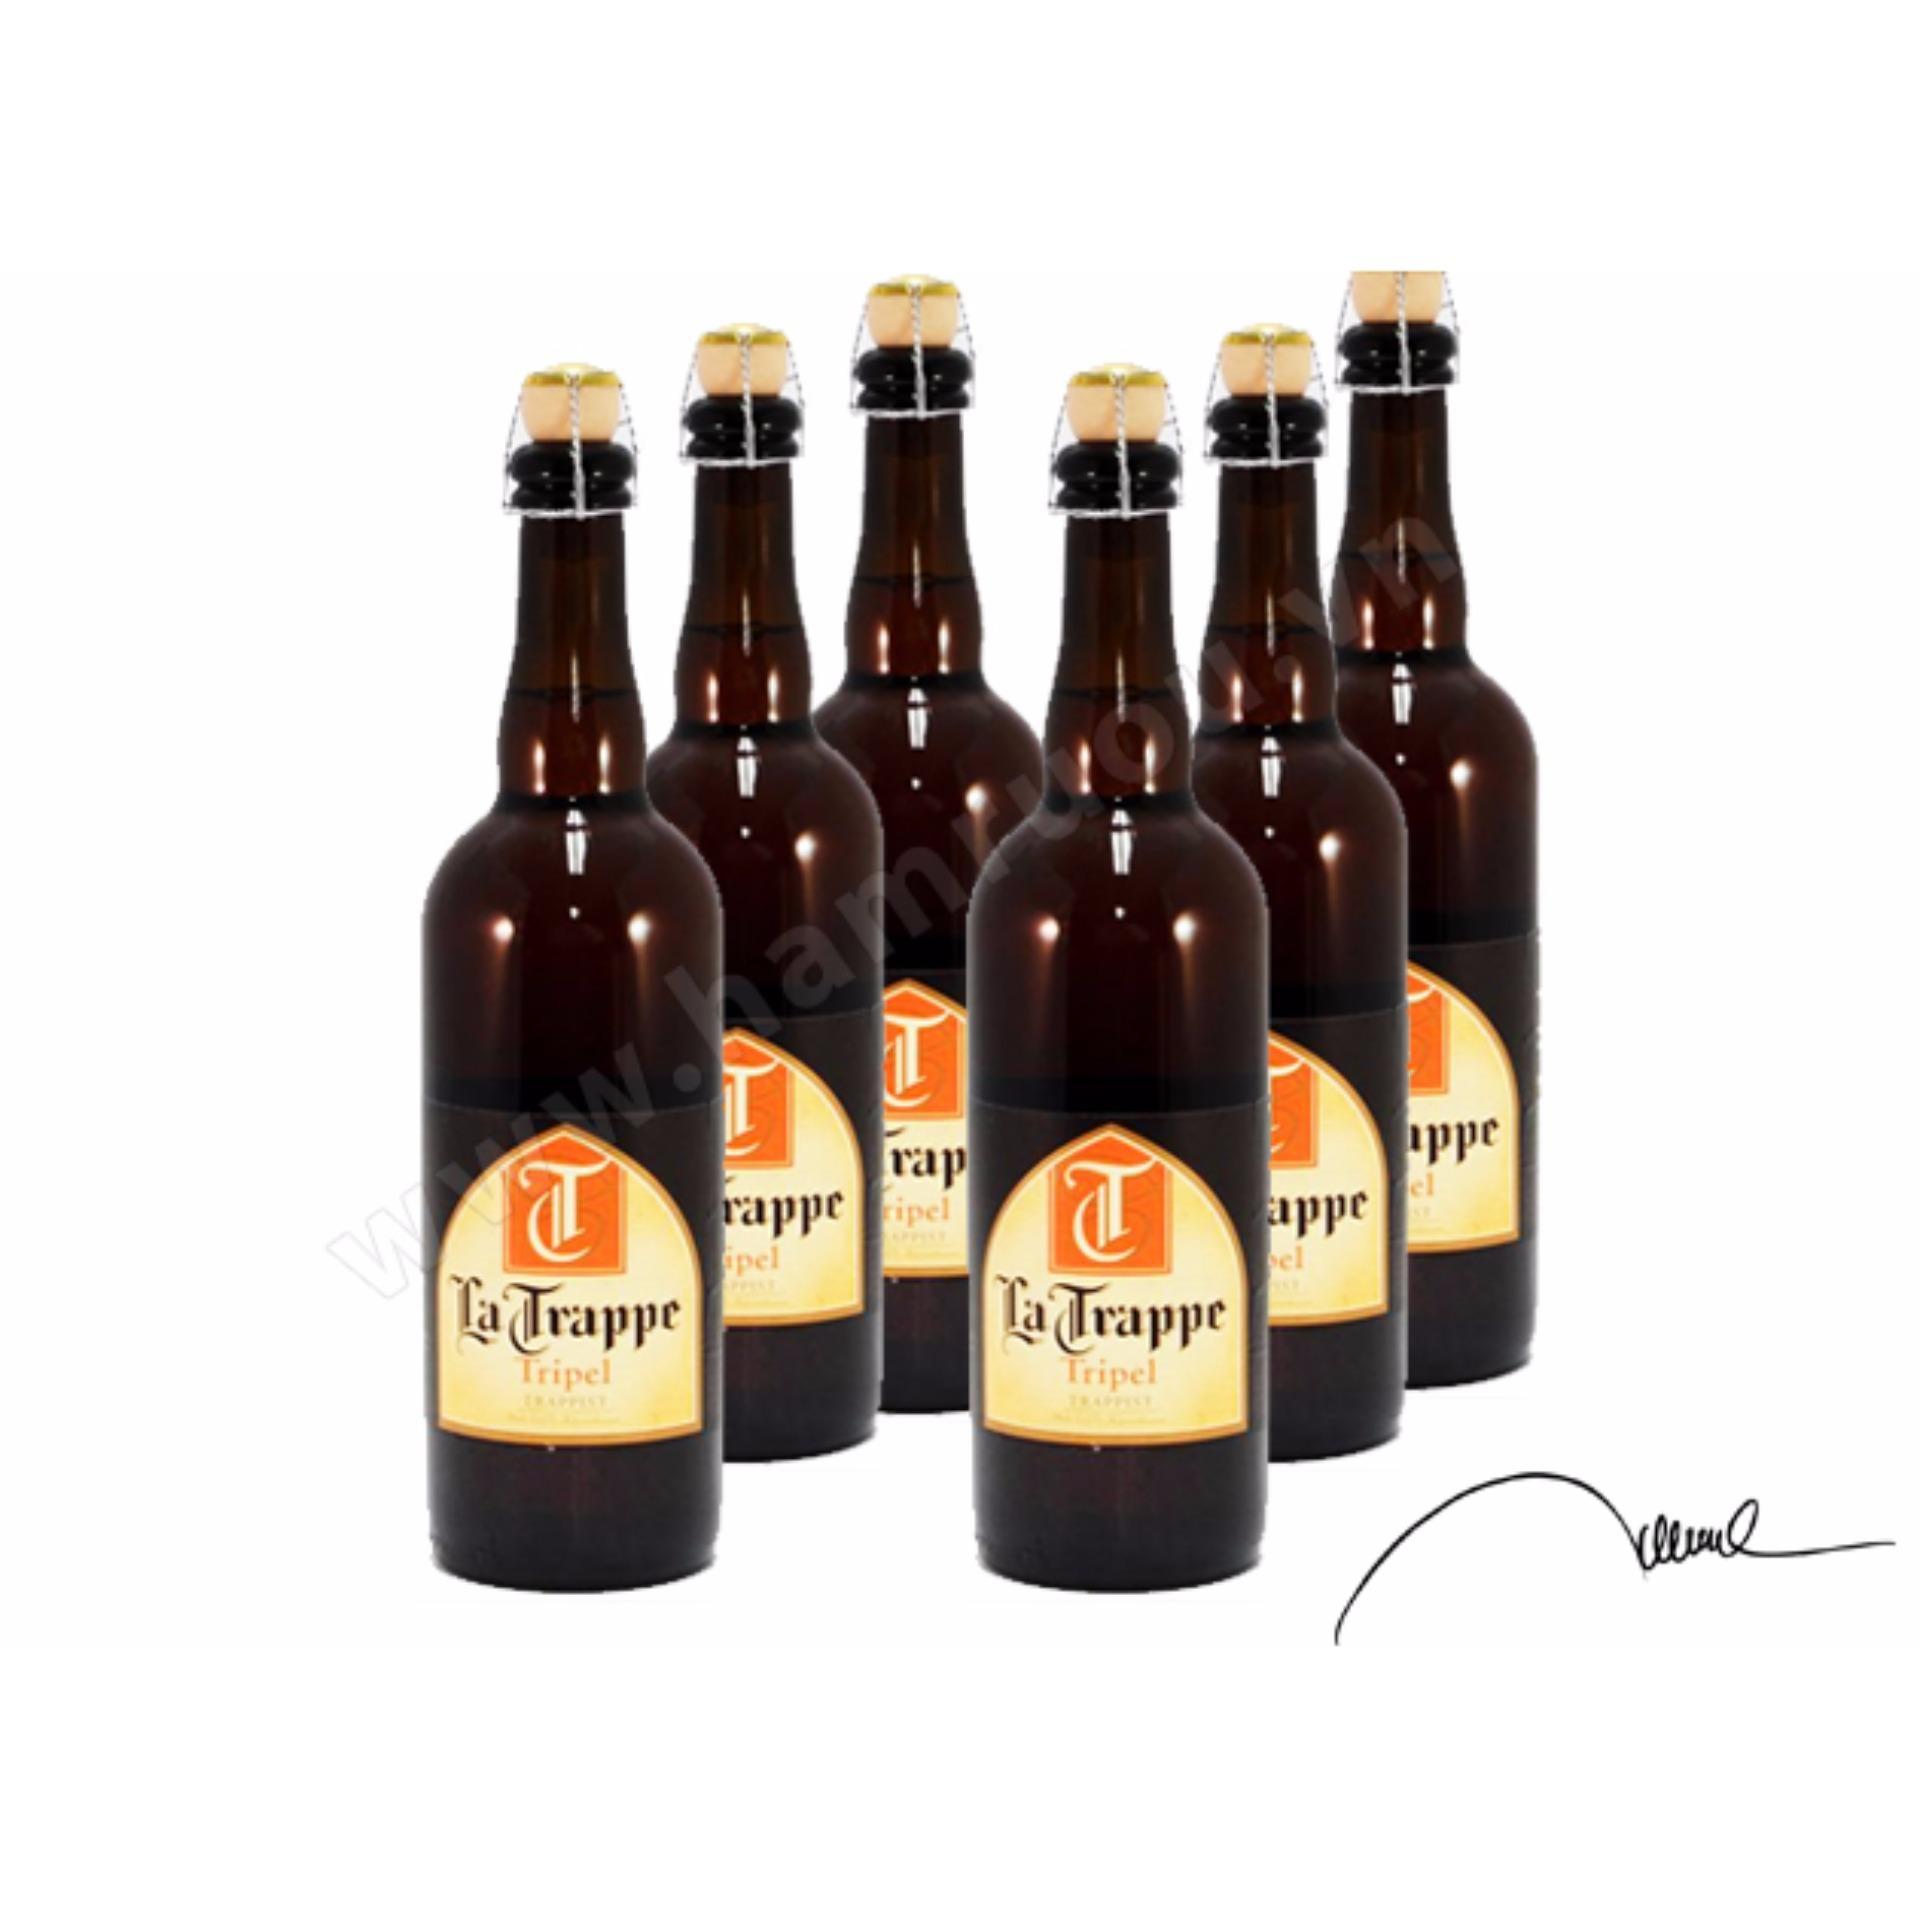 Giá Khuyến Mại Bia La Trappe Tripel 6 Chai 750ml – La Trappe Tripel Beer – Holland Beer – Netherlands Beer – Bia La Hà Lan Trappe Tripel